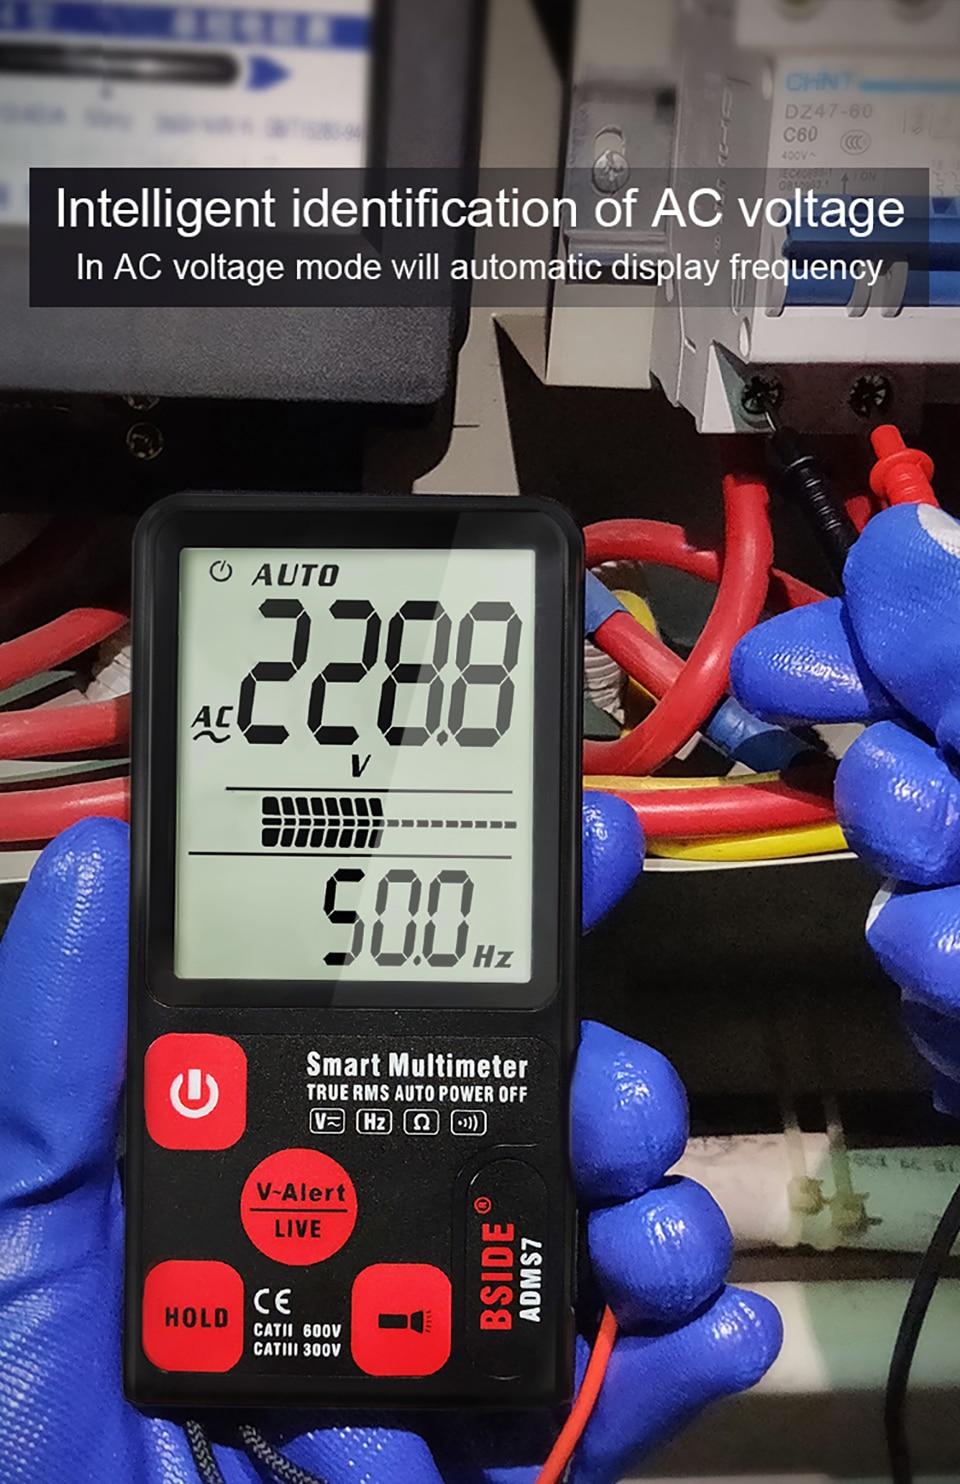 "H787d0f23d1414e2dabda7c0080ae8c8dX Ultra-Portable Digital Multimeter BSIDE ADMS7 S9CL Large 3.5"" LCD 3-Line Display Voltmeter DMM AC DC Voltage NCV Ohm Hz Tester"